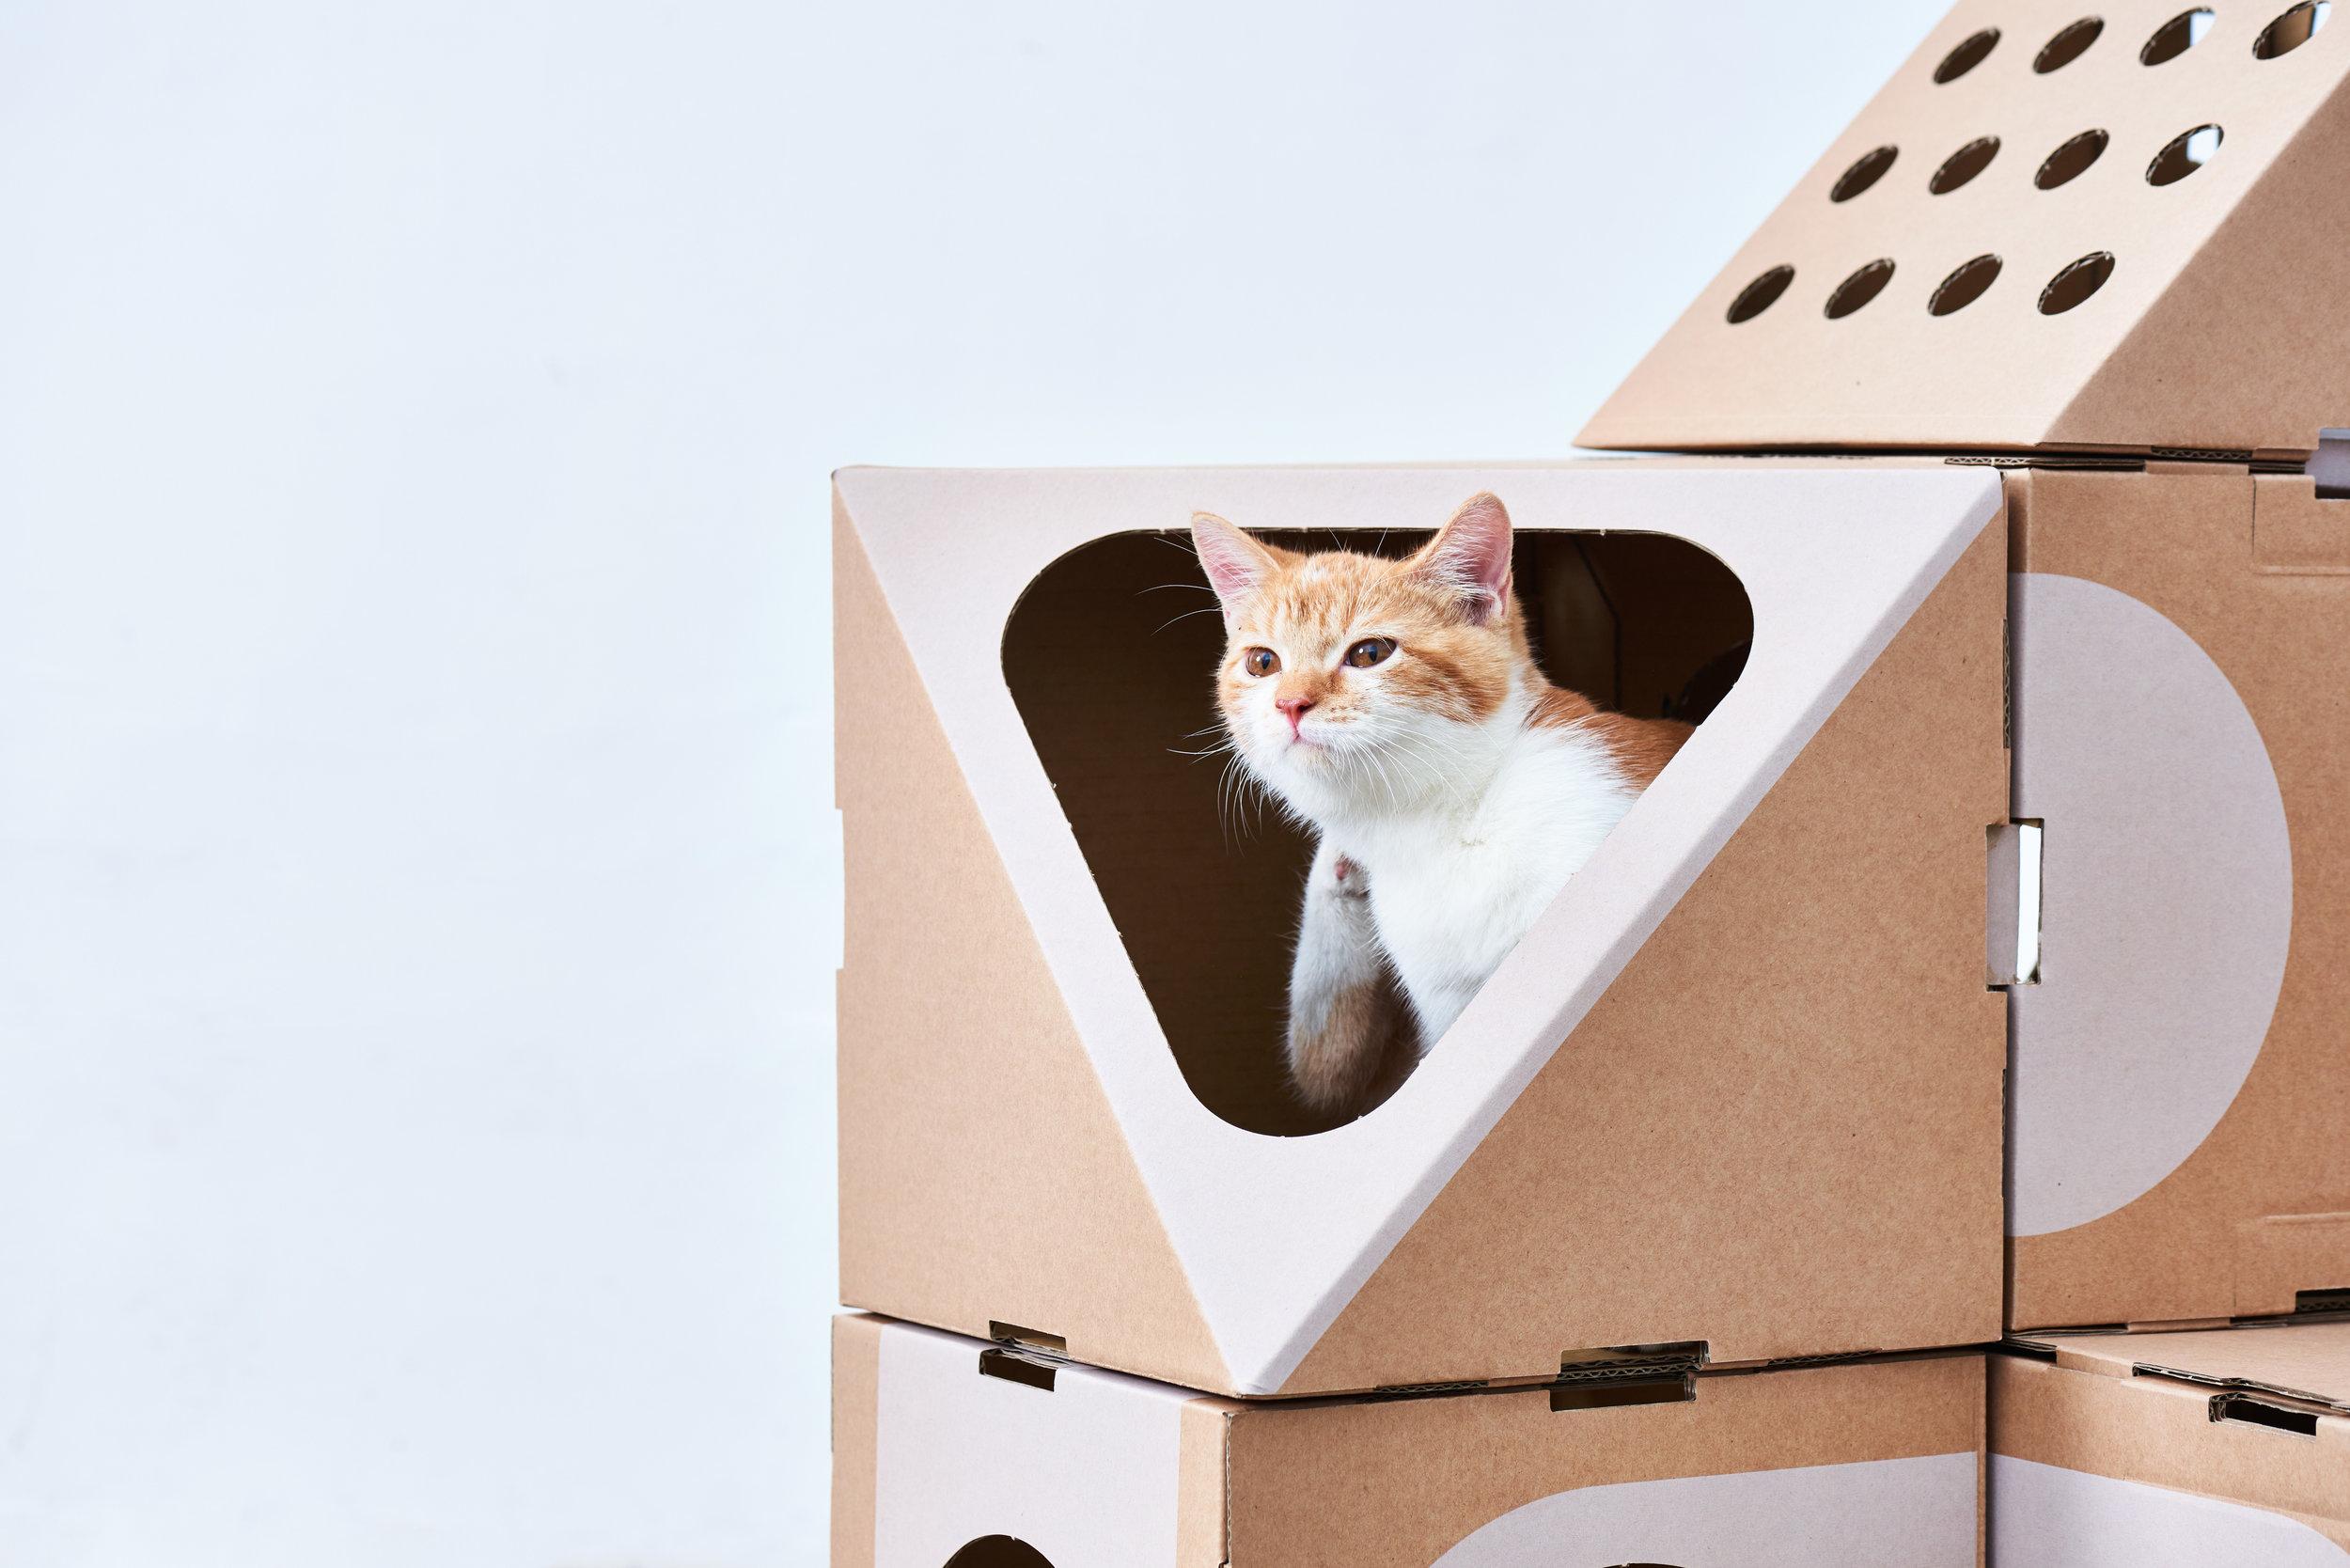 A_CAT_THING_03_CloseUp-002.jpg